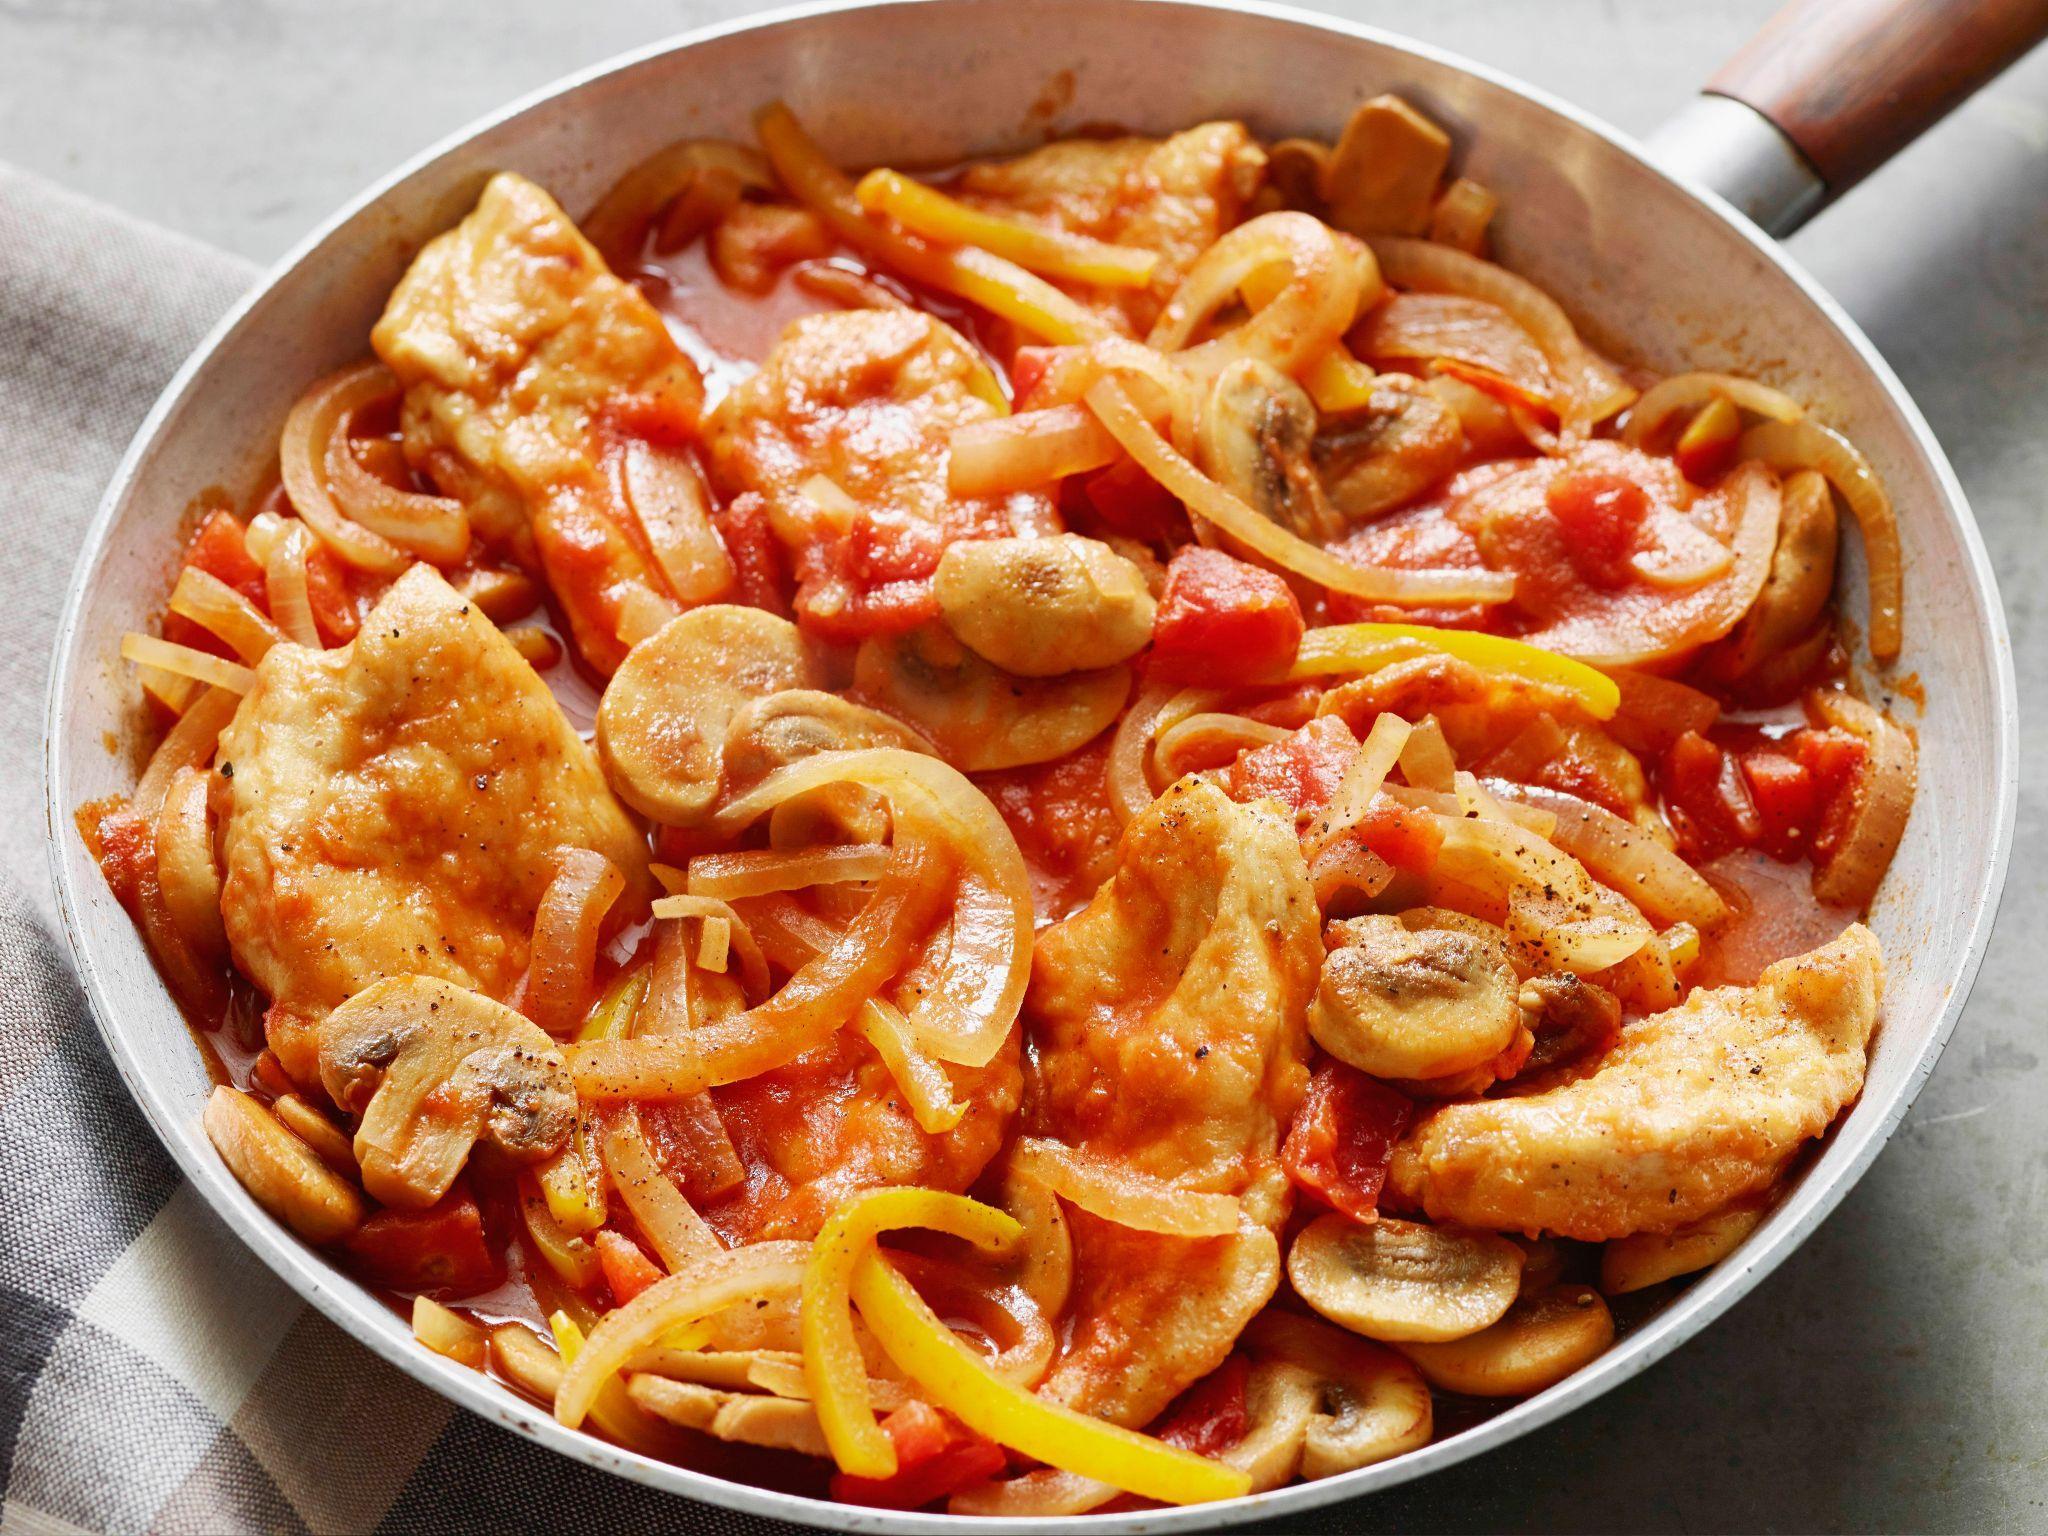 4 step chicken marengo recipe chicken marengo recipes and foods 4 step chicken marengo recipe from melissa darabian via food network forumfinder Image collections